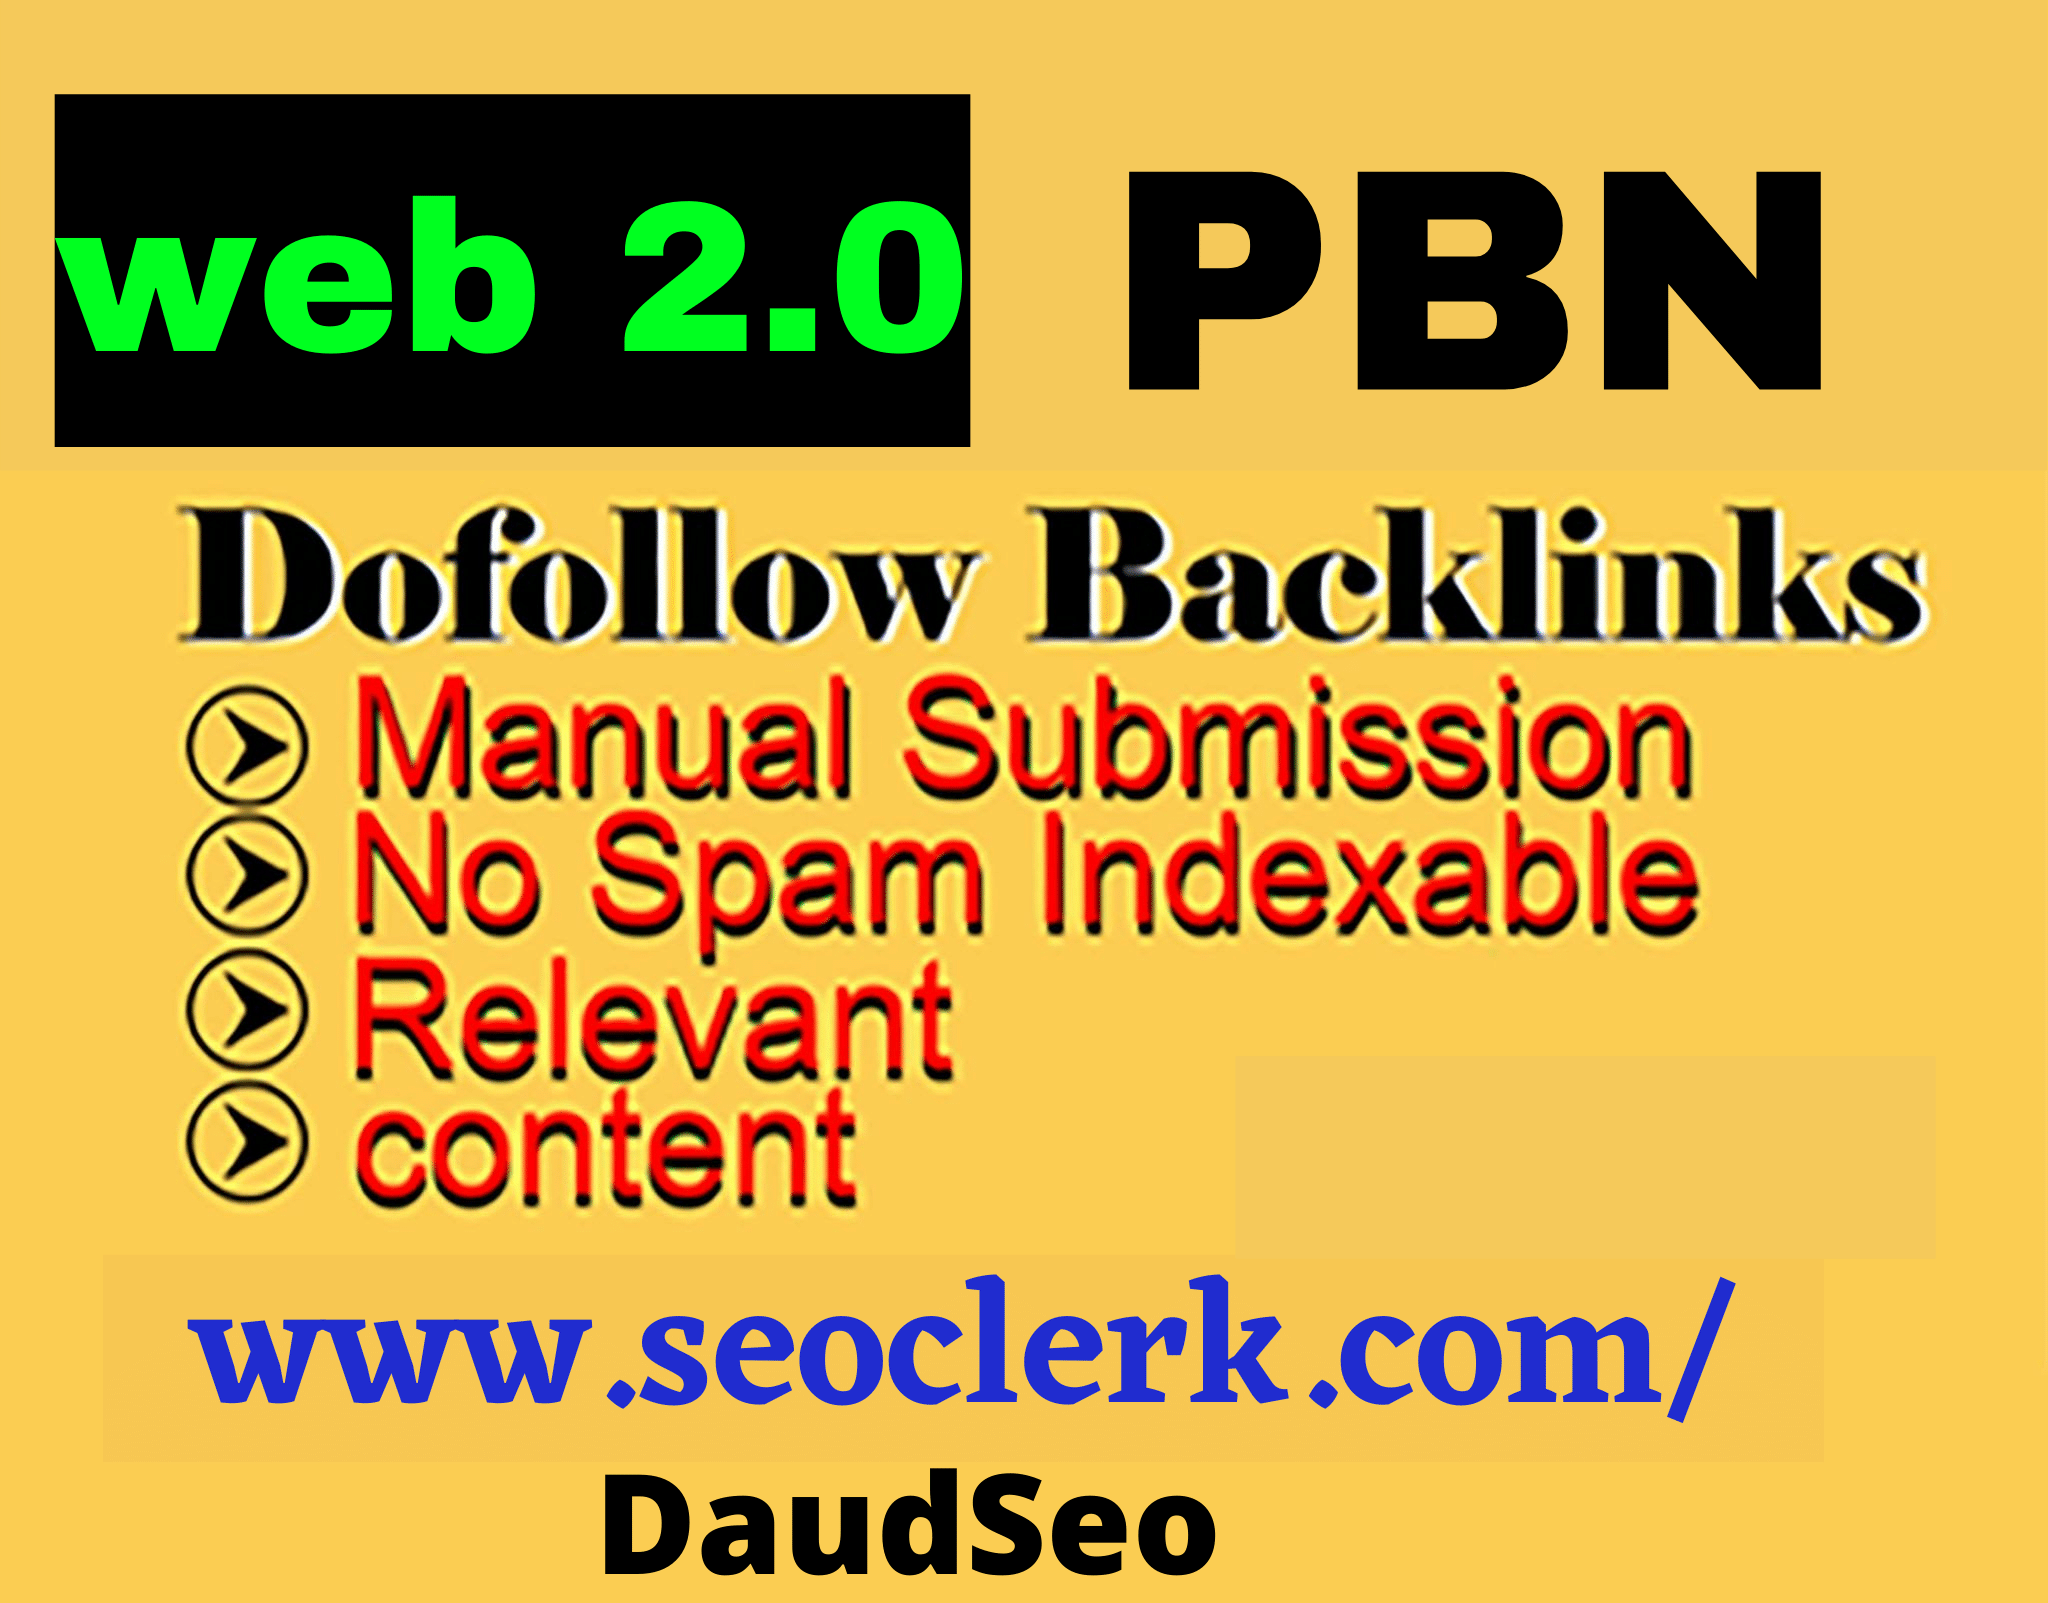 I will create 20 High Authority DoFollow Web2.0 PBN Backlinks